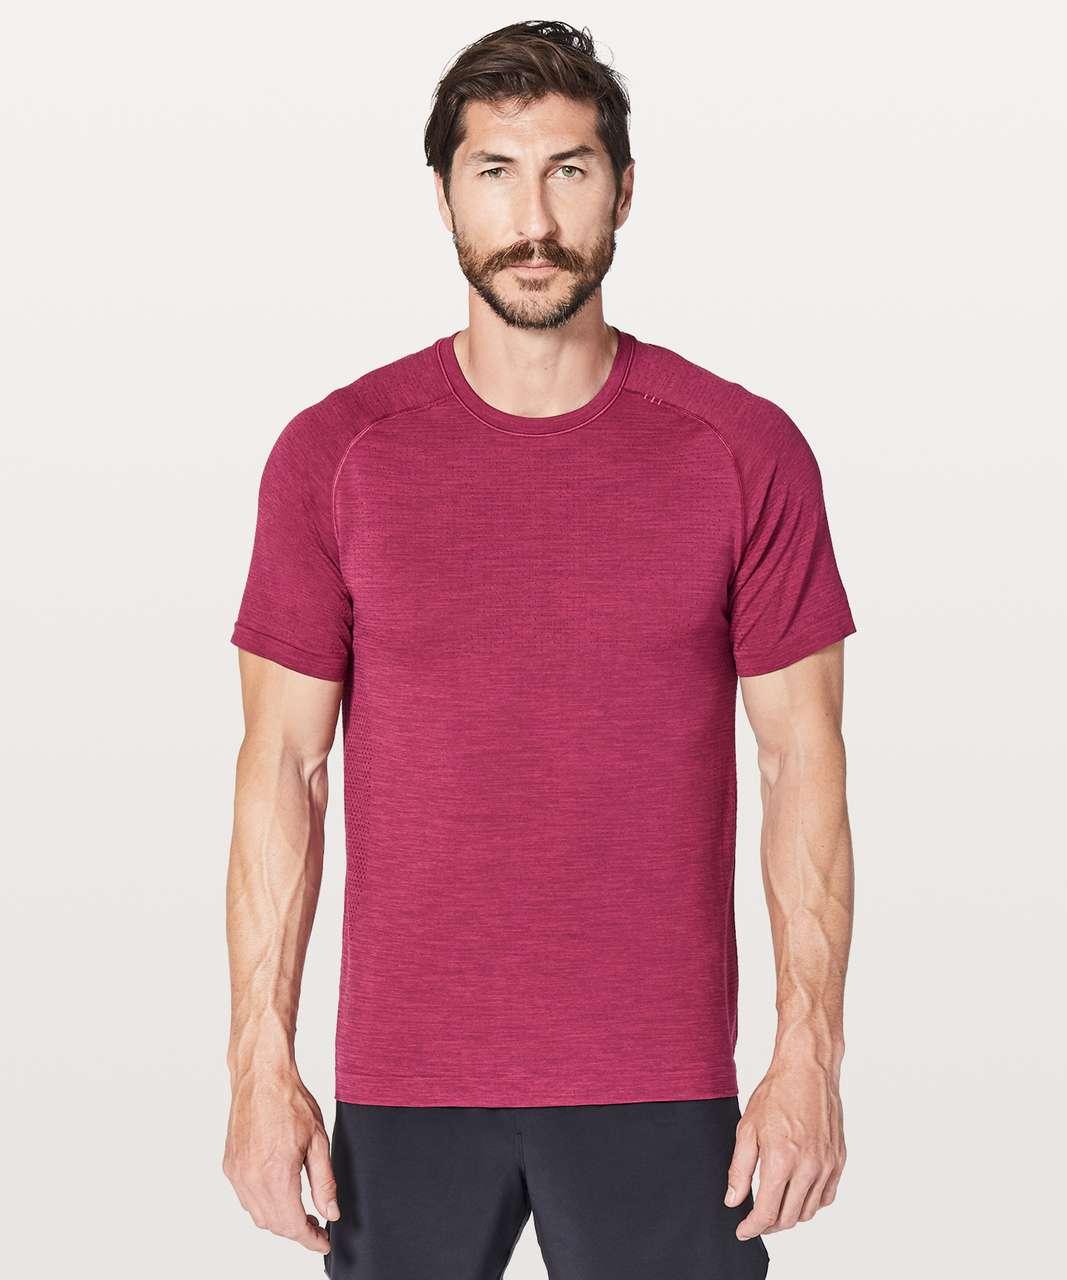 Lululemon Metal Vent Tech Surge Short Sleeve - Violet Red / Dashing Purple